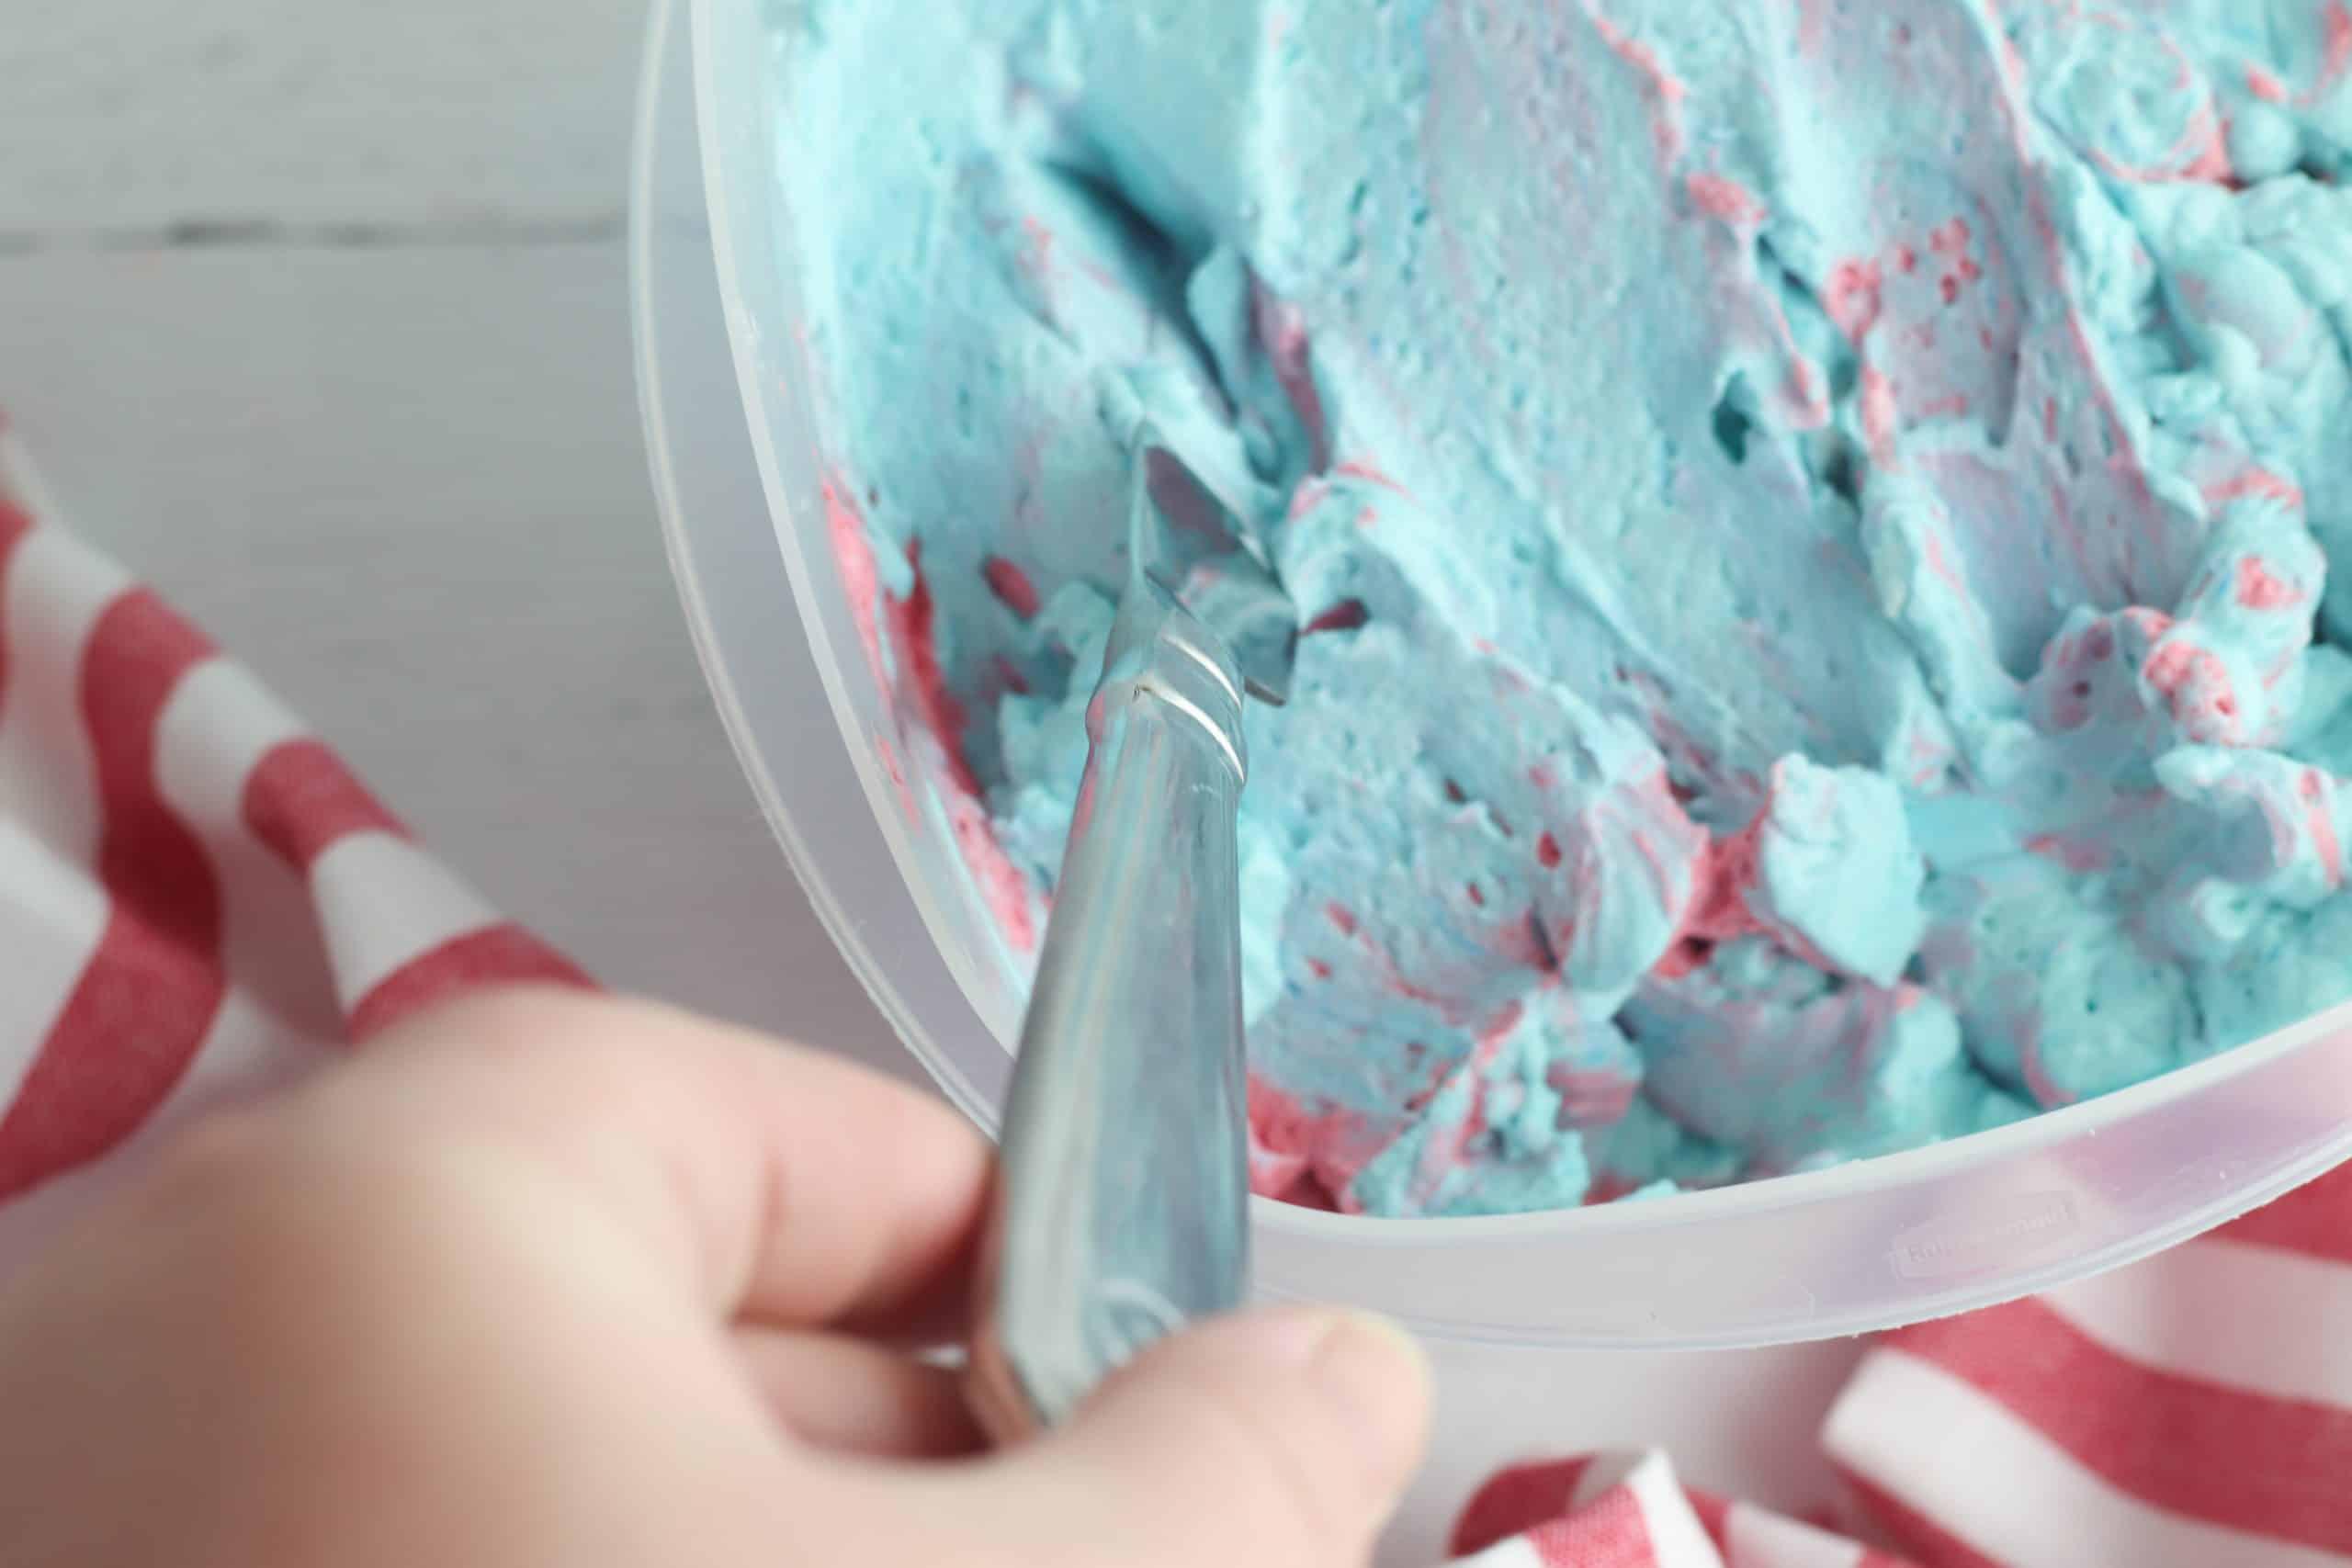 Kool Aid Ice Cream in Freezer Container